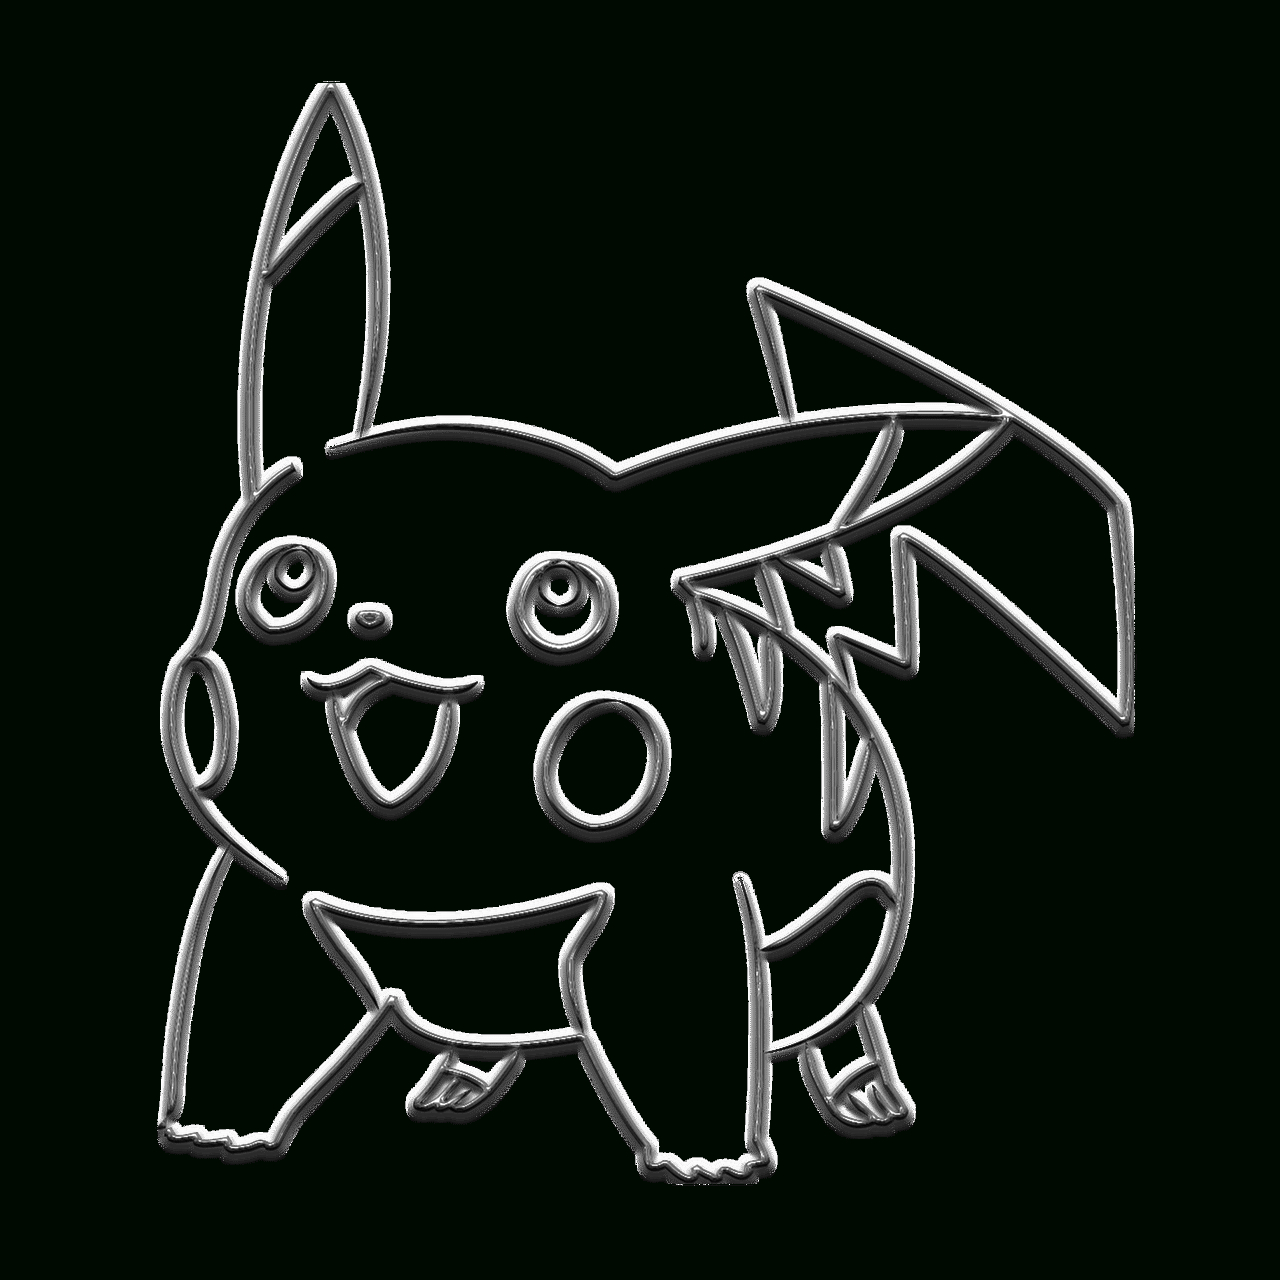 Comment Dessiner Pokemon avec Modele De Pokemon A Dessiner